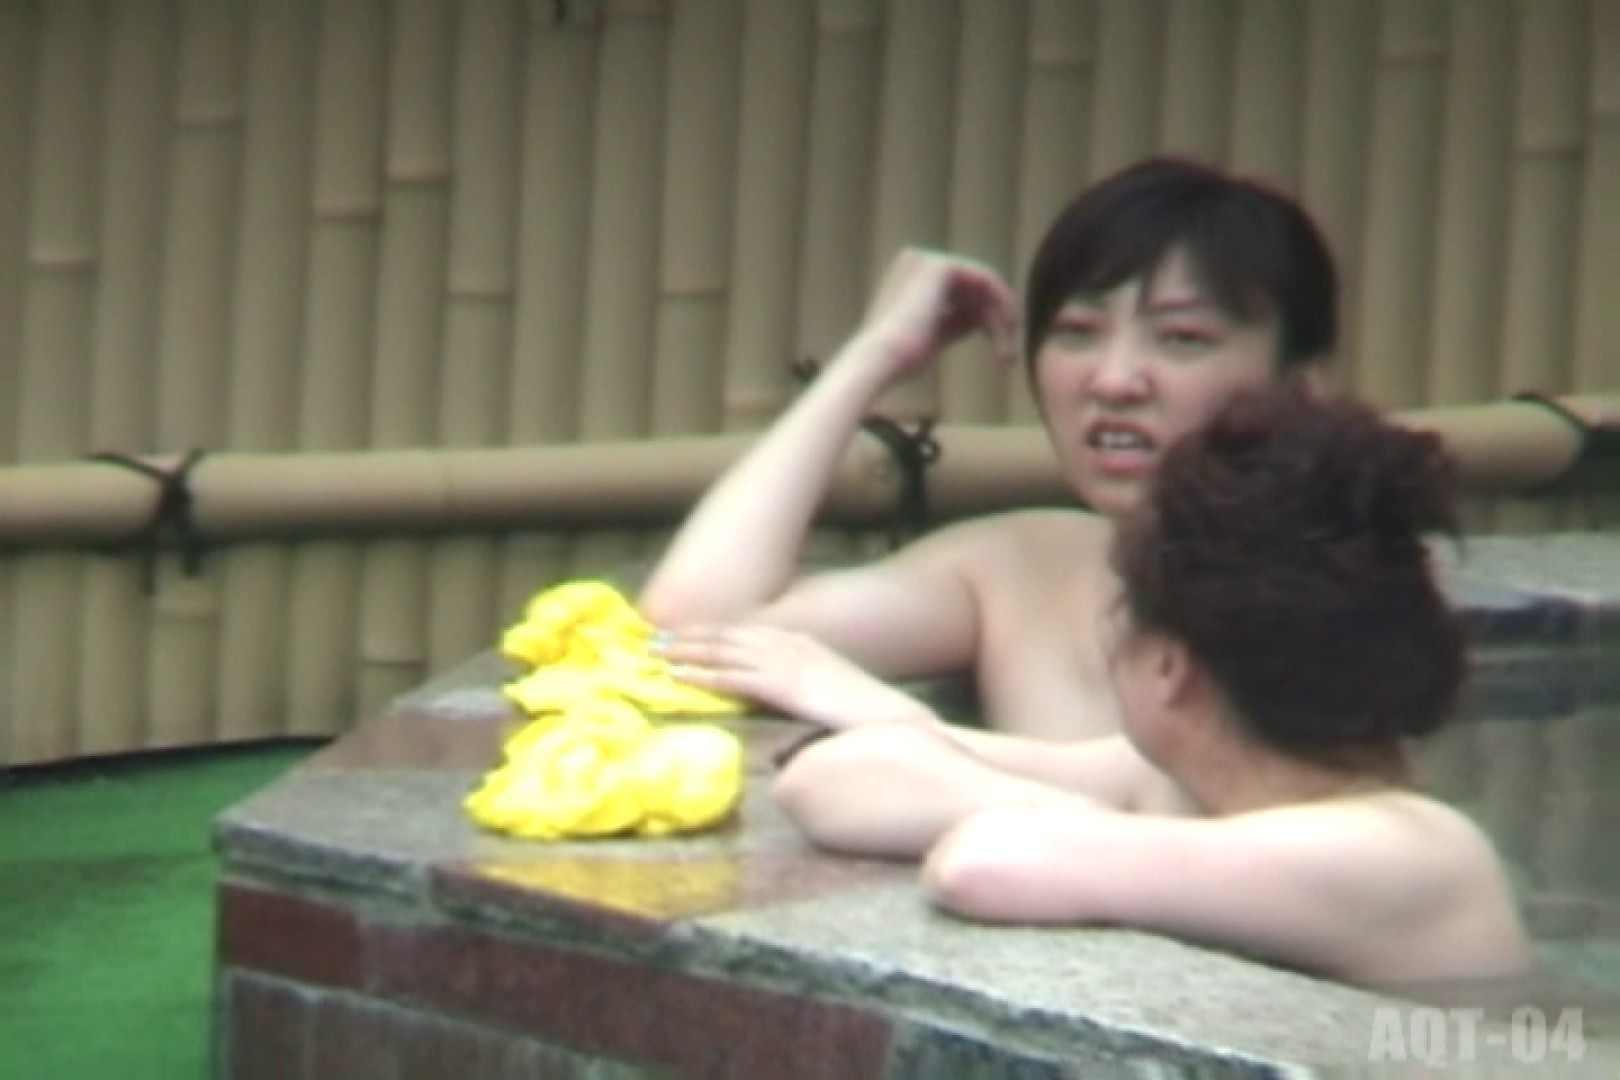 Aquaな露天風呂Vol.743 盗撮師作品 オマンコ無修正動画無料 91pic 41